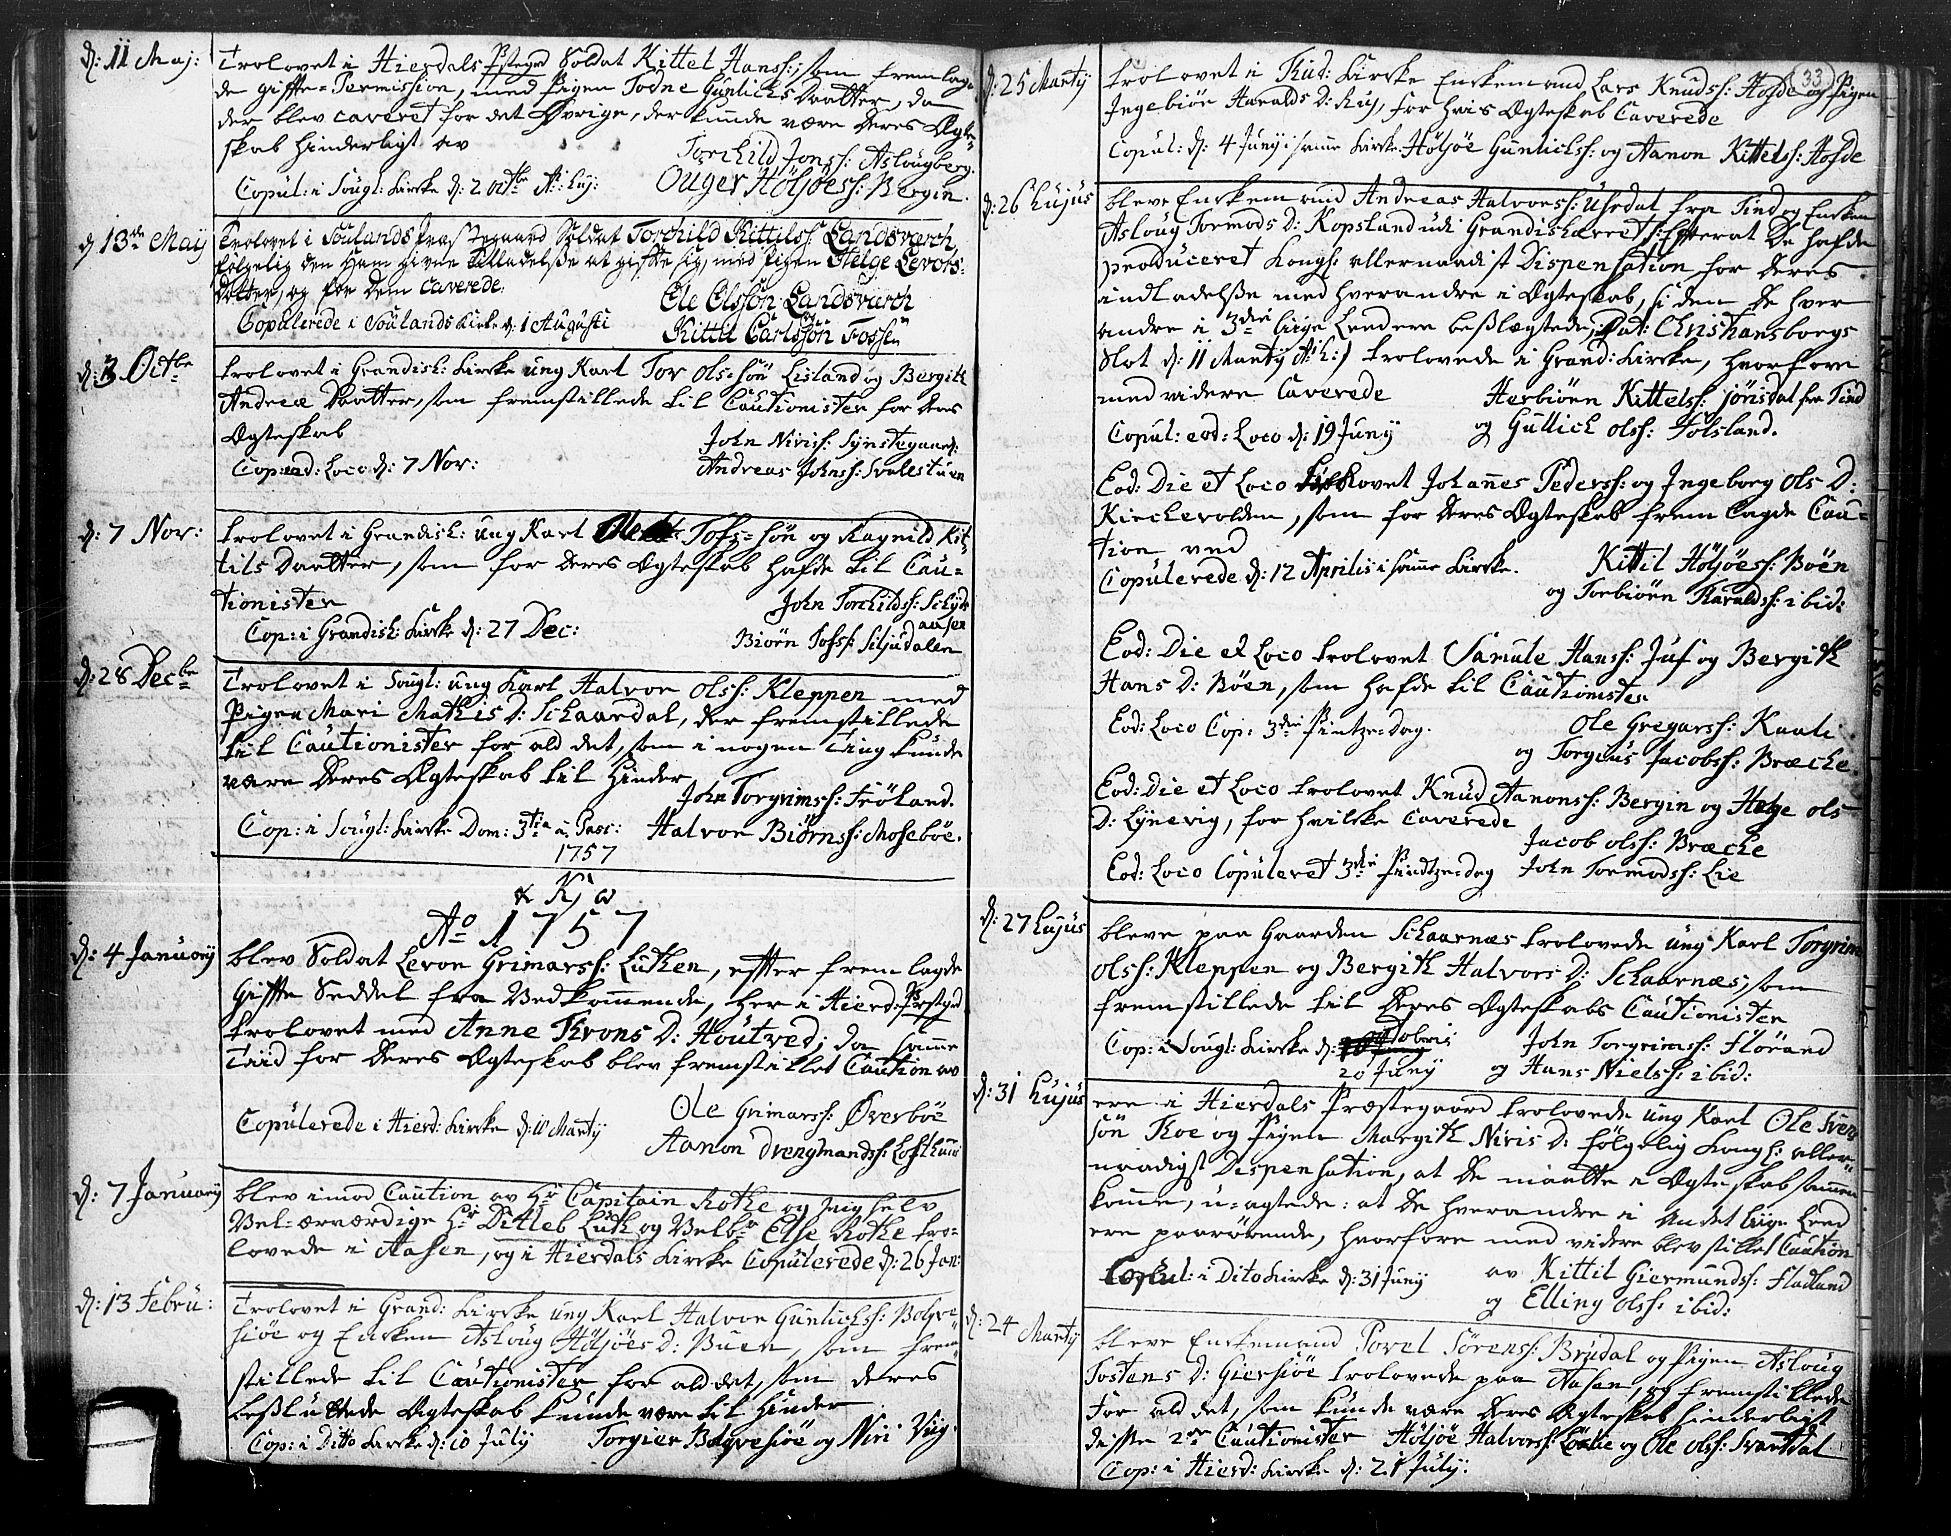 SAKO, Hjartdal kirkebøker, F/Fa/L0004: Ministerialbok nr. I 4, 1727-1795, s. 33